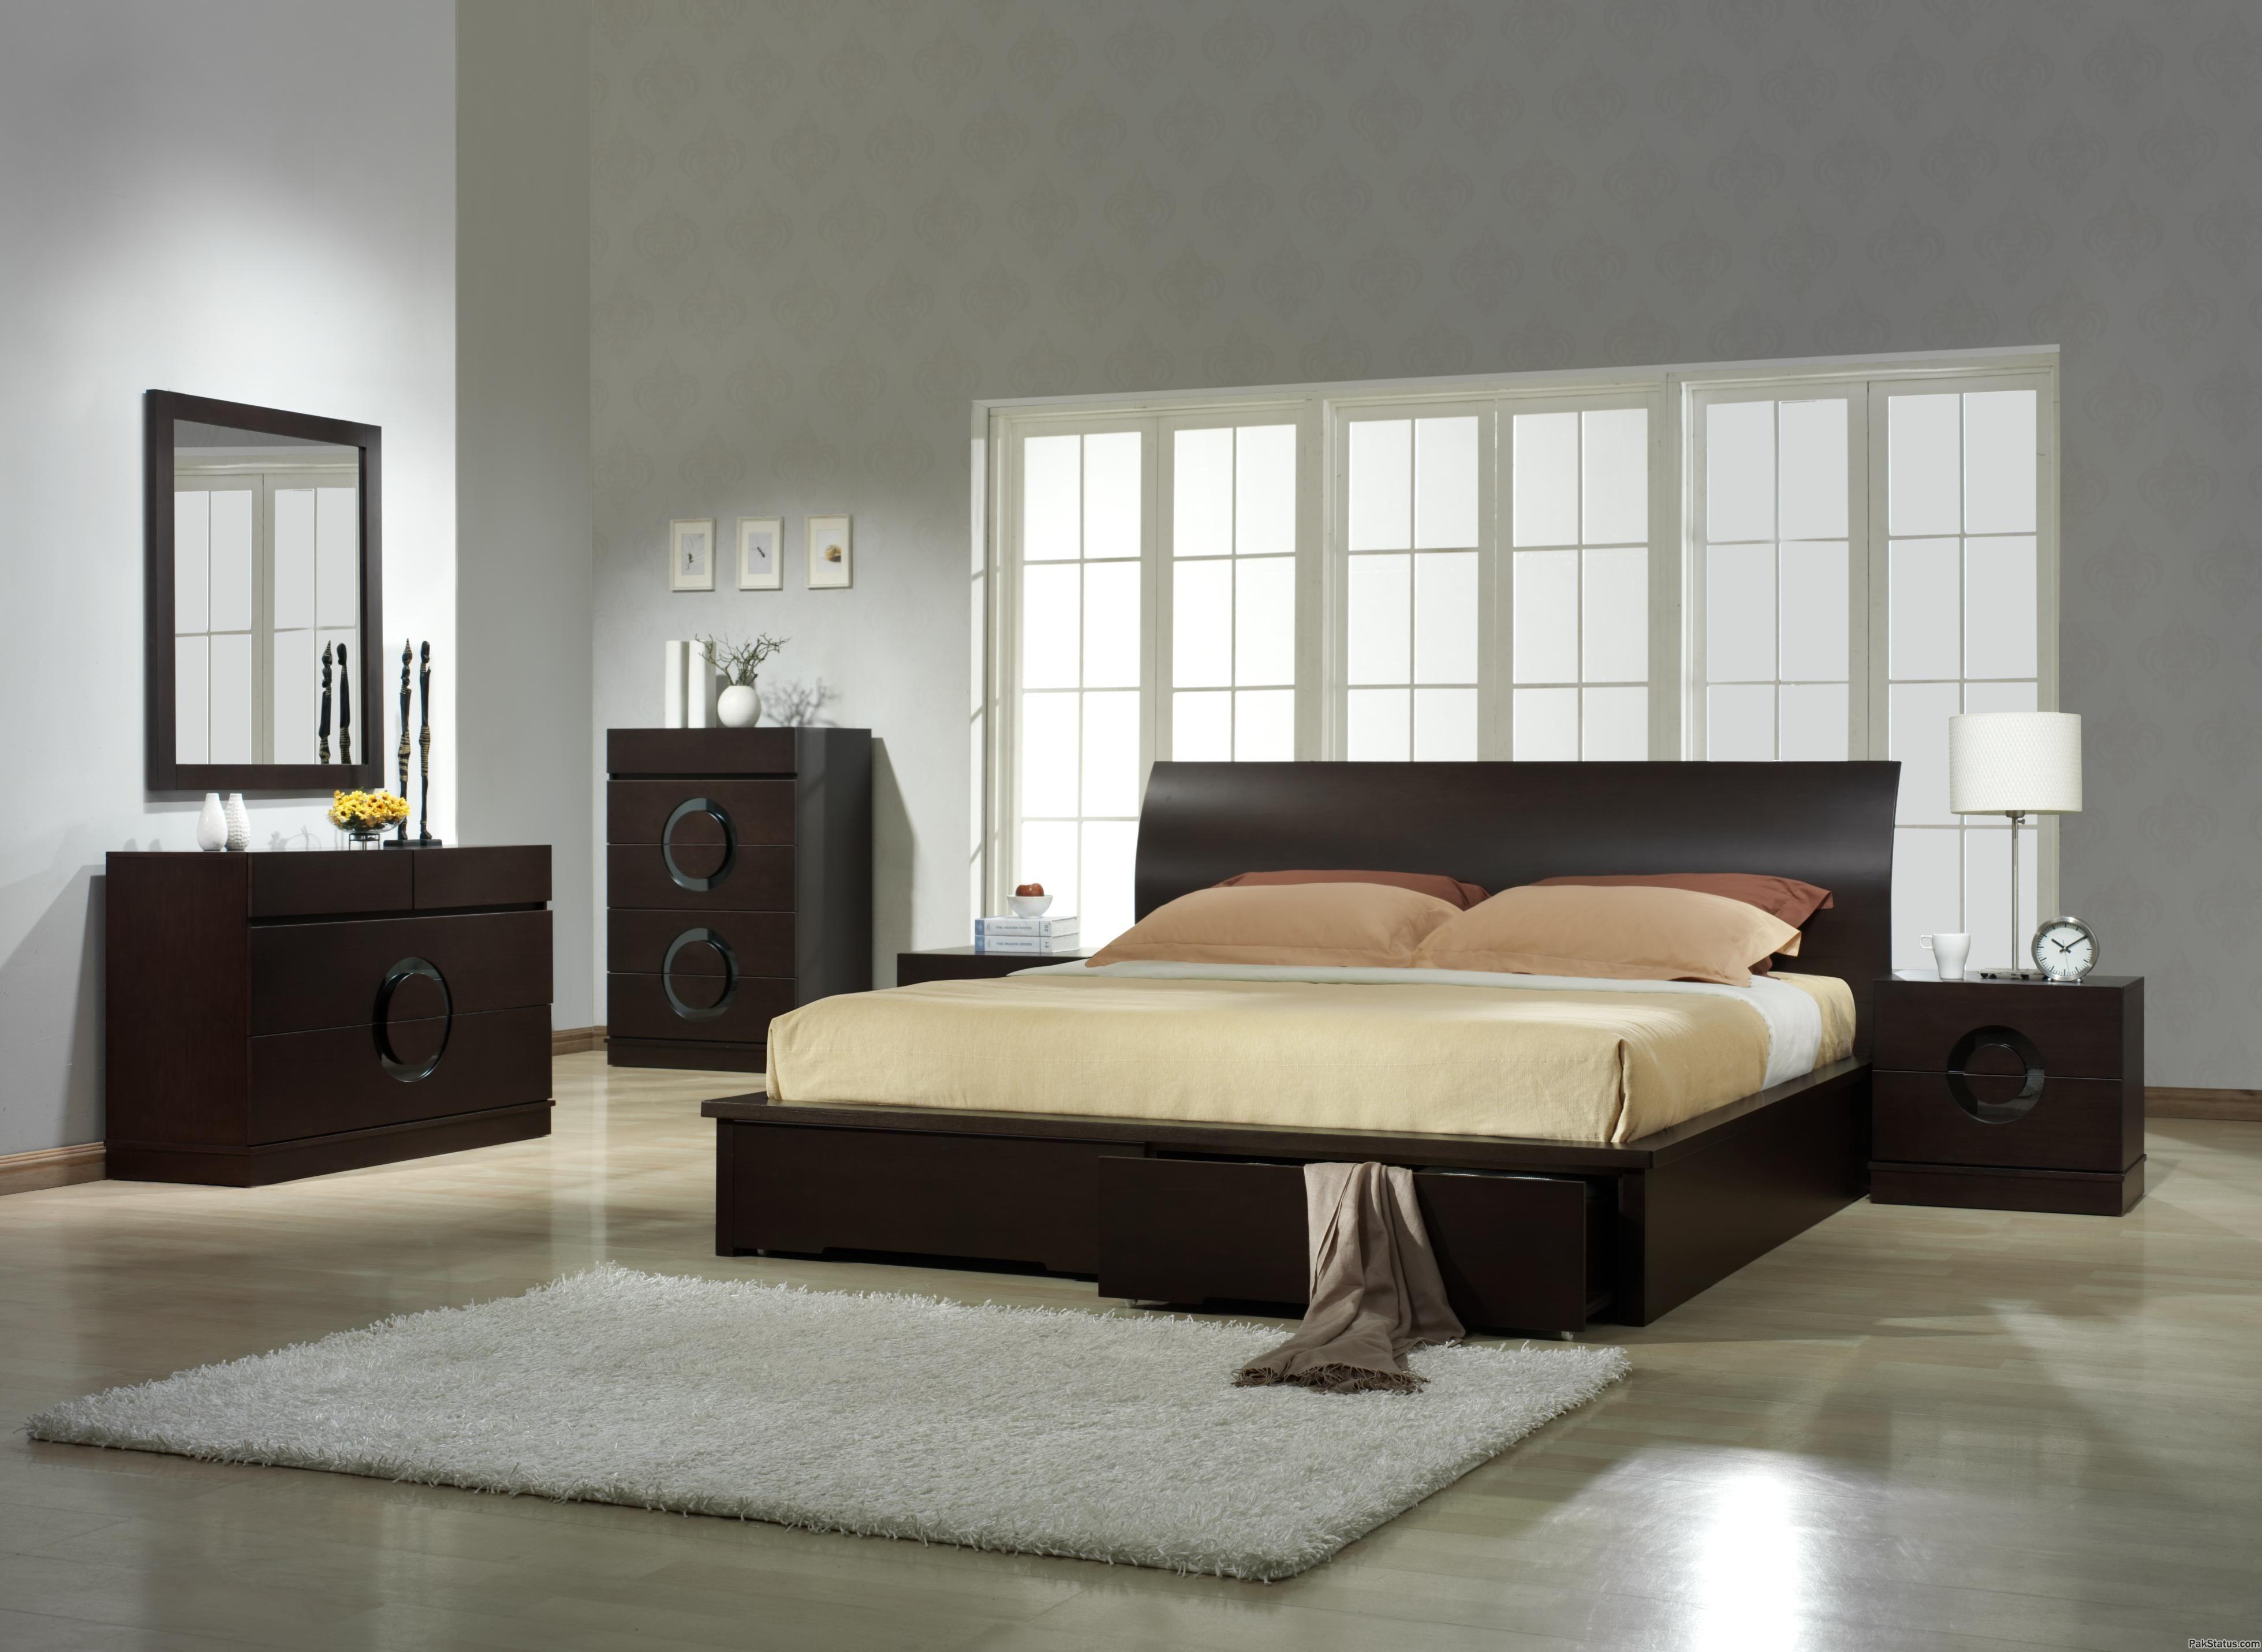 Simple Bedroom Design In Pakistan Modern Bedroom Furniture